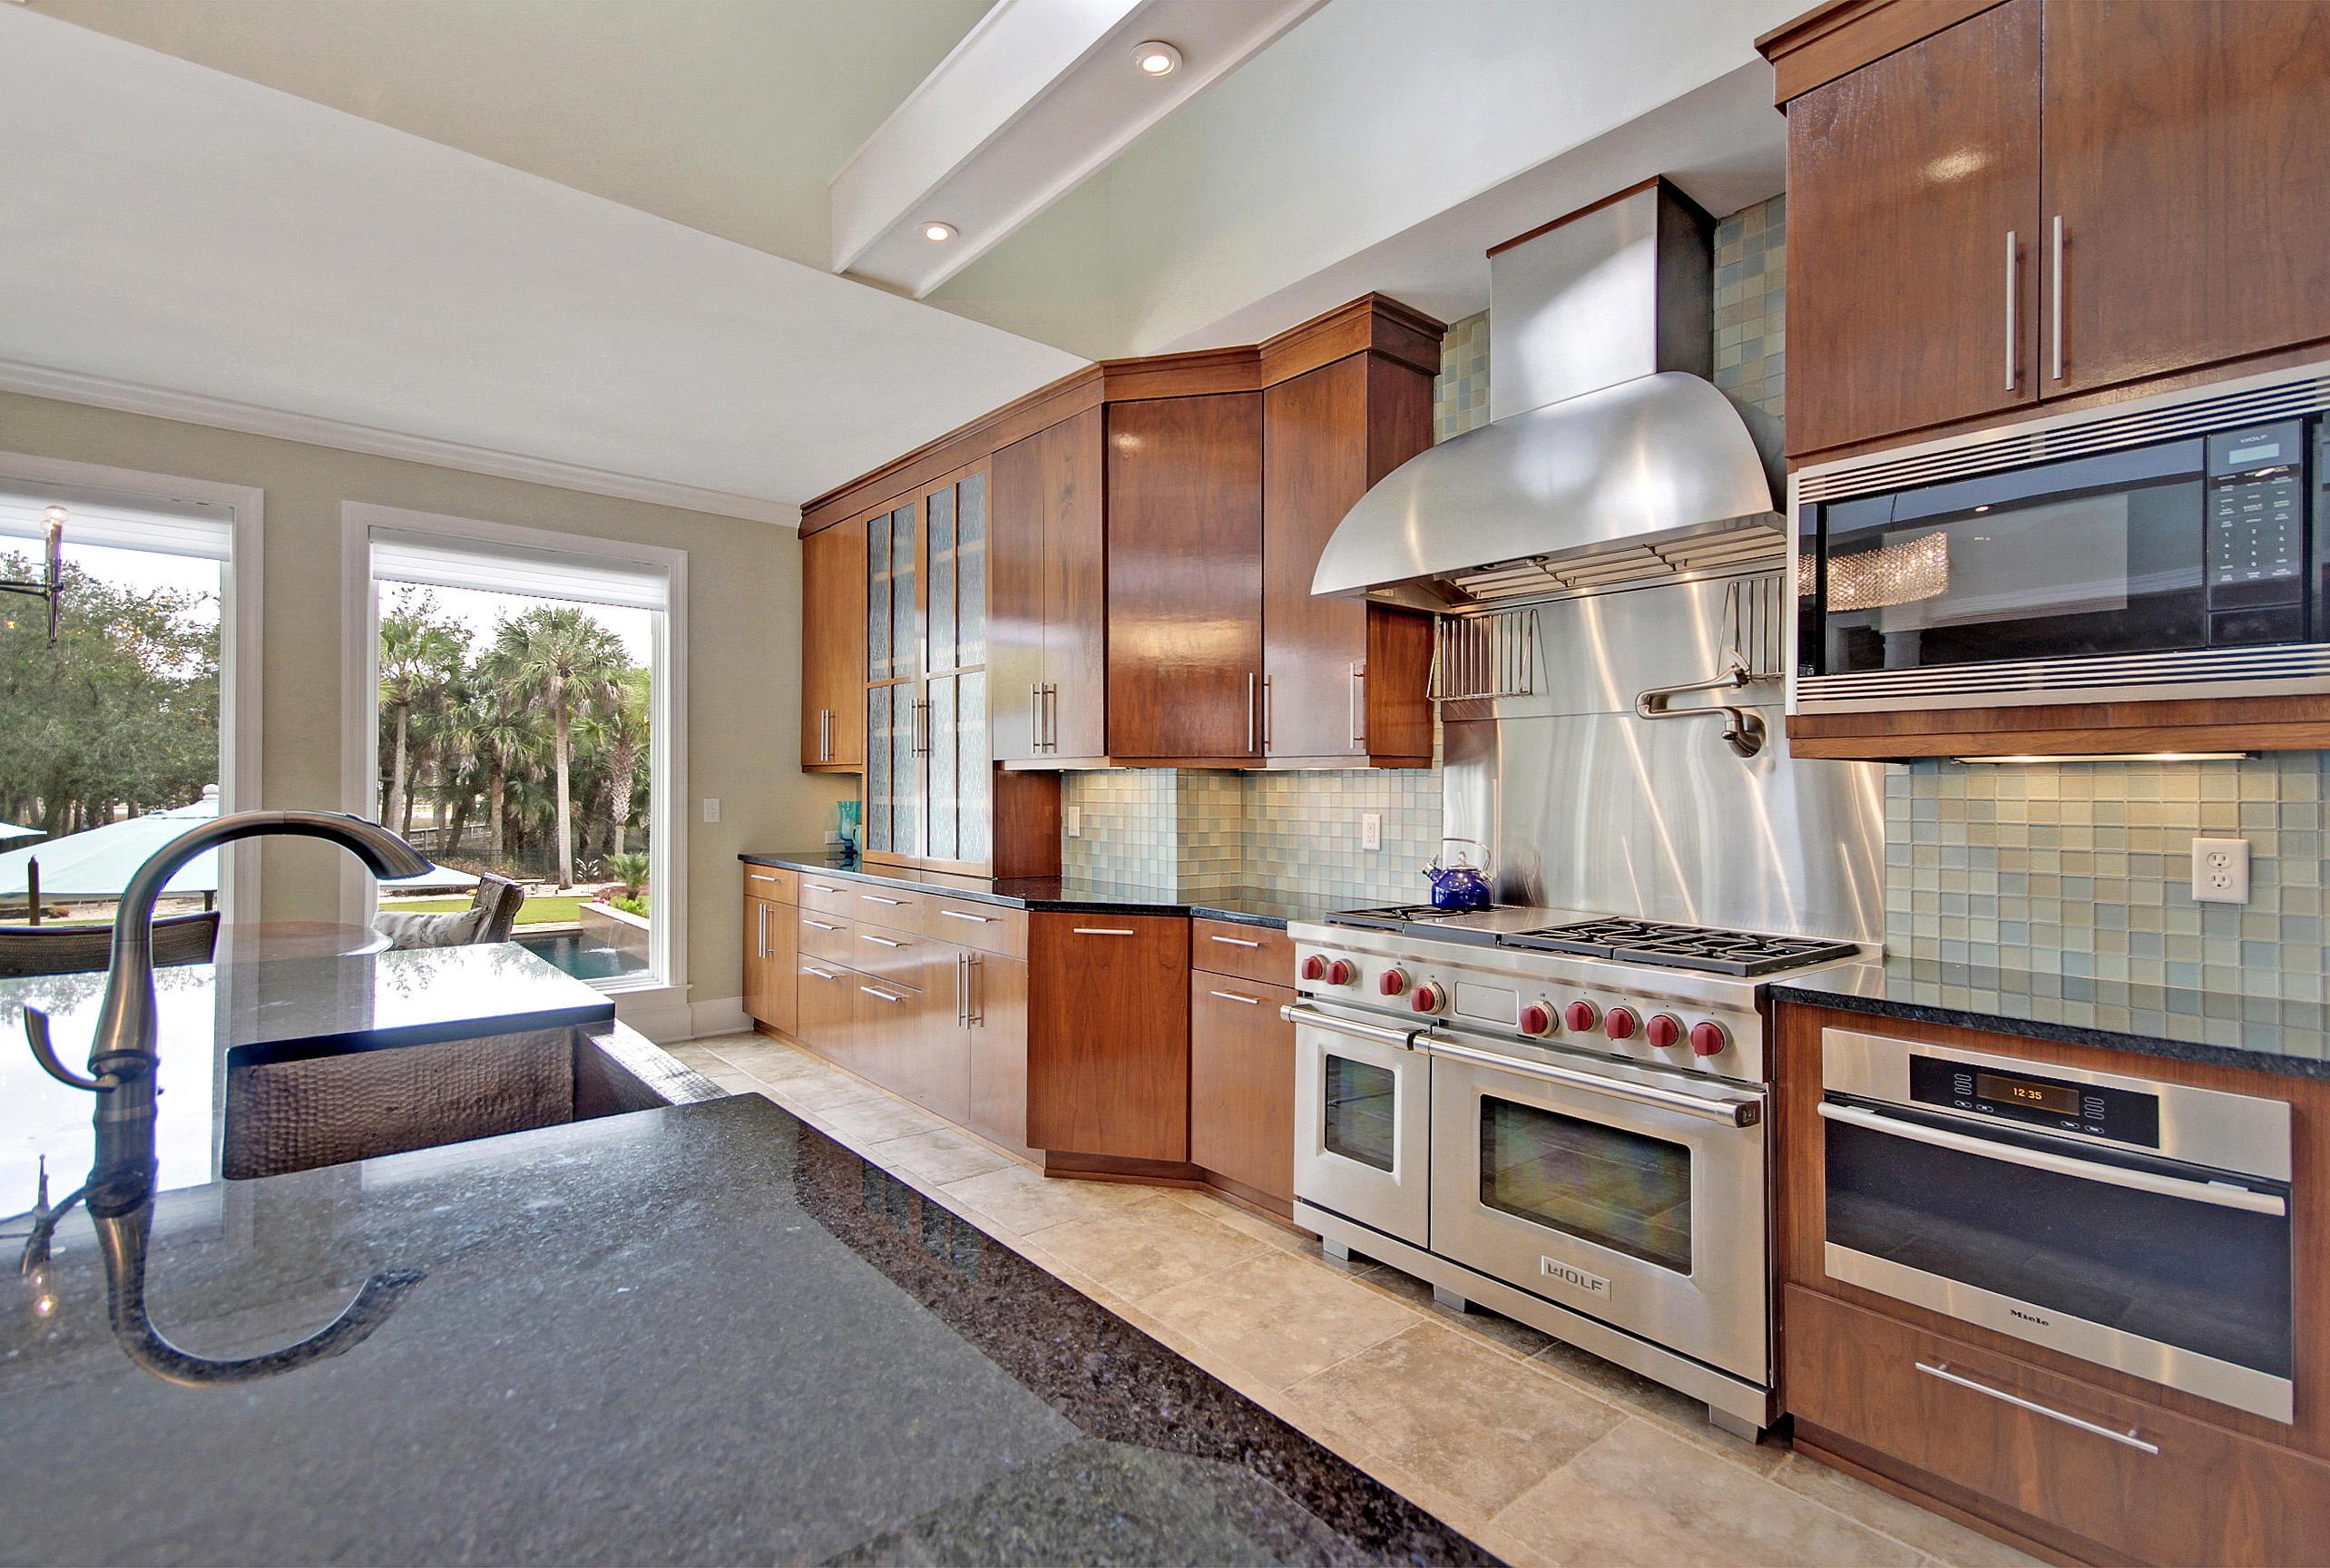 Dunes West Homes For Sale - 2364 Darts Cove, Mount Pleasant, SC - 54